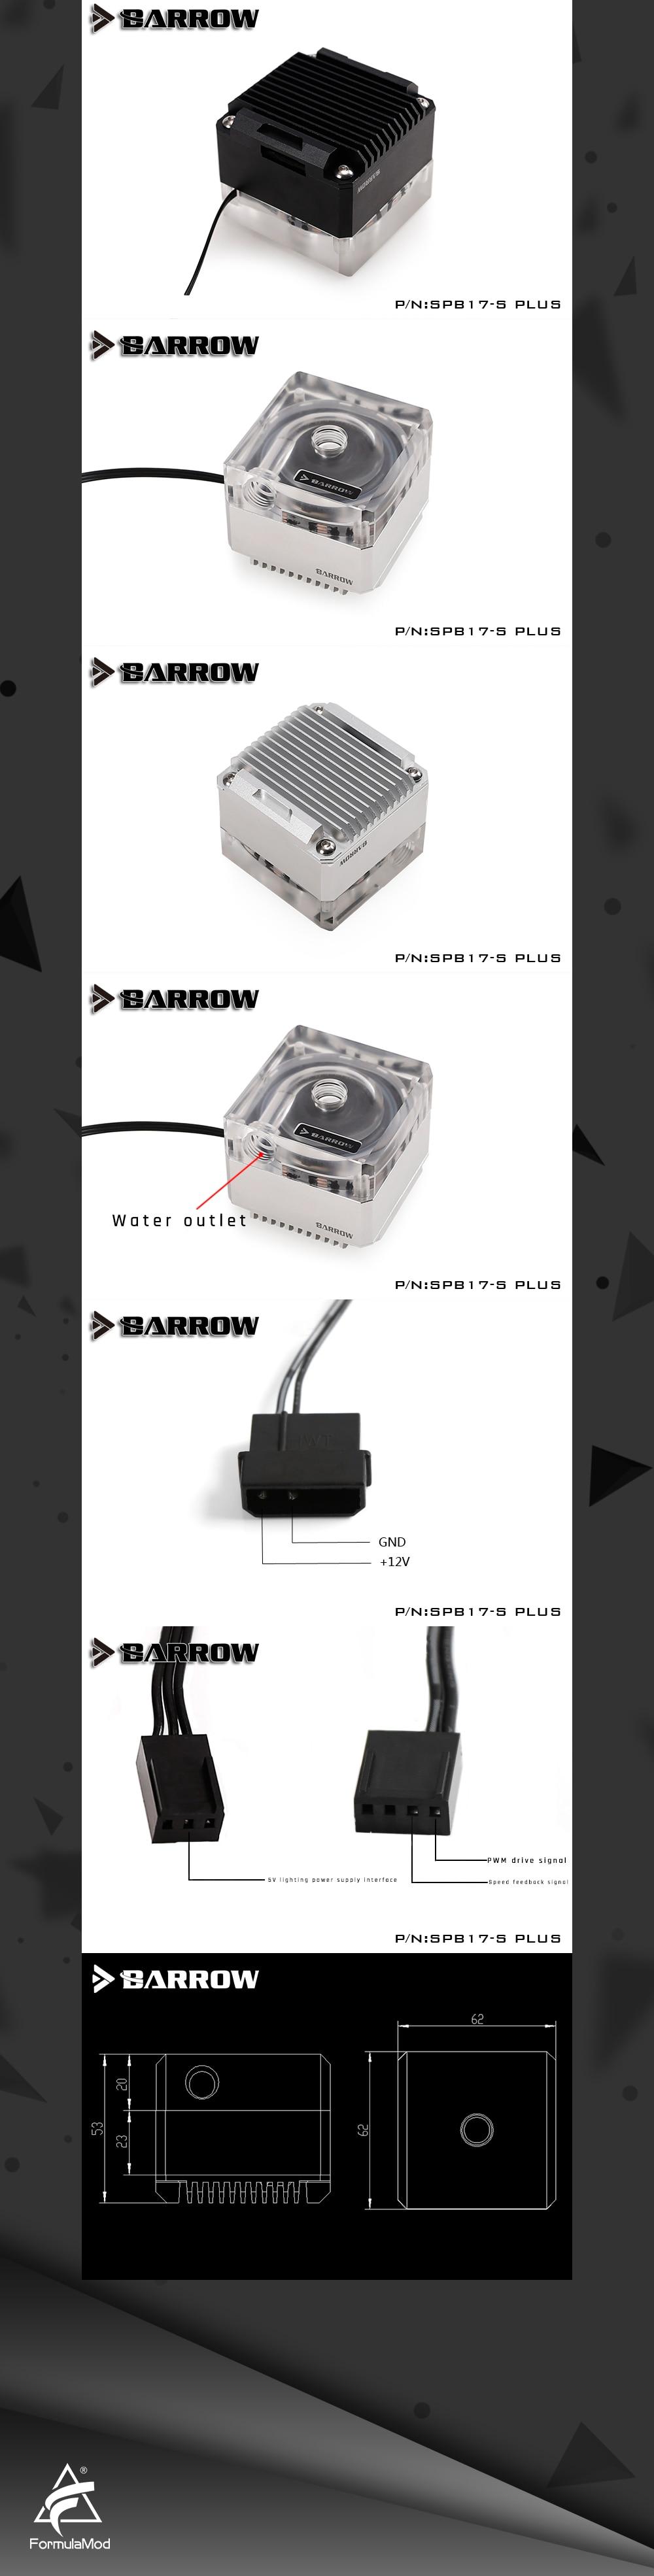 Barrow SPB17-S-PLUS, PLUS Version 17W PWM Pumps, LRC 2.0 With Aluminum Radiator Cover,